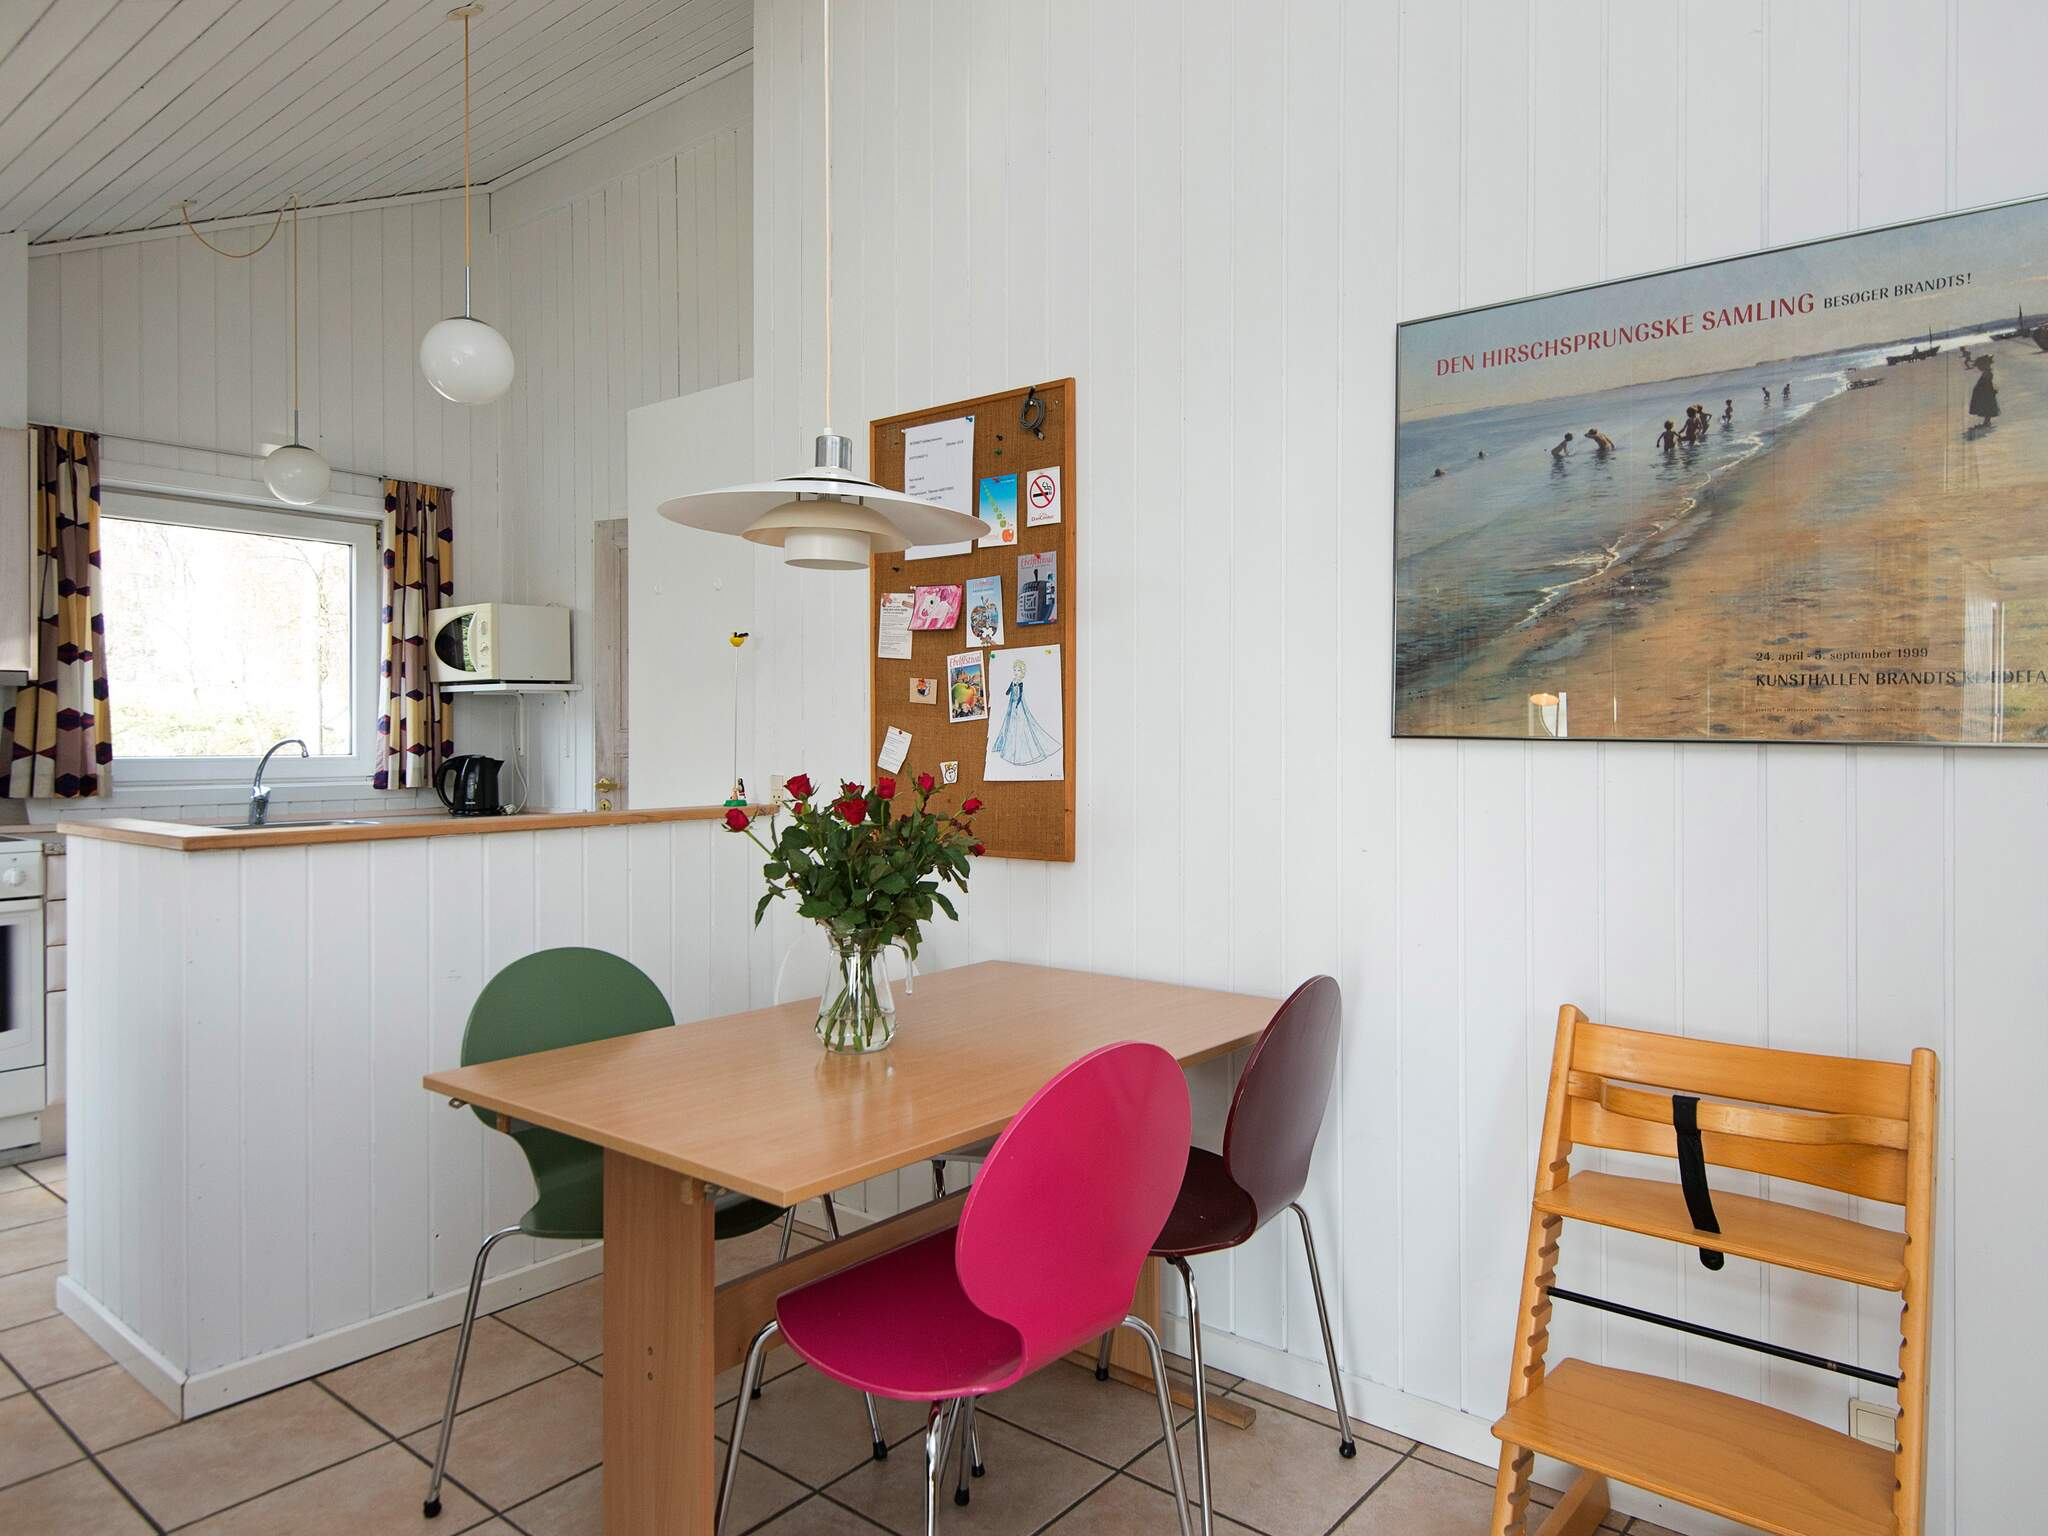 Ferienhaus Lyngsbæk Strand (493391), Ebeltoft, , Ostjütland, Dänemark, Bild 5